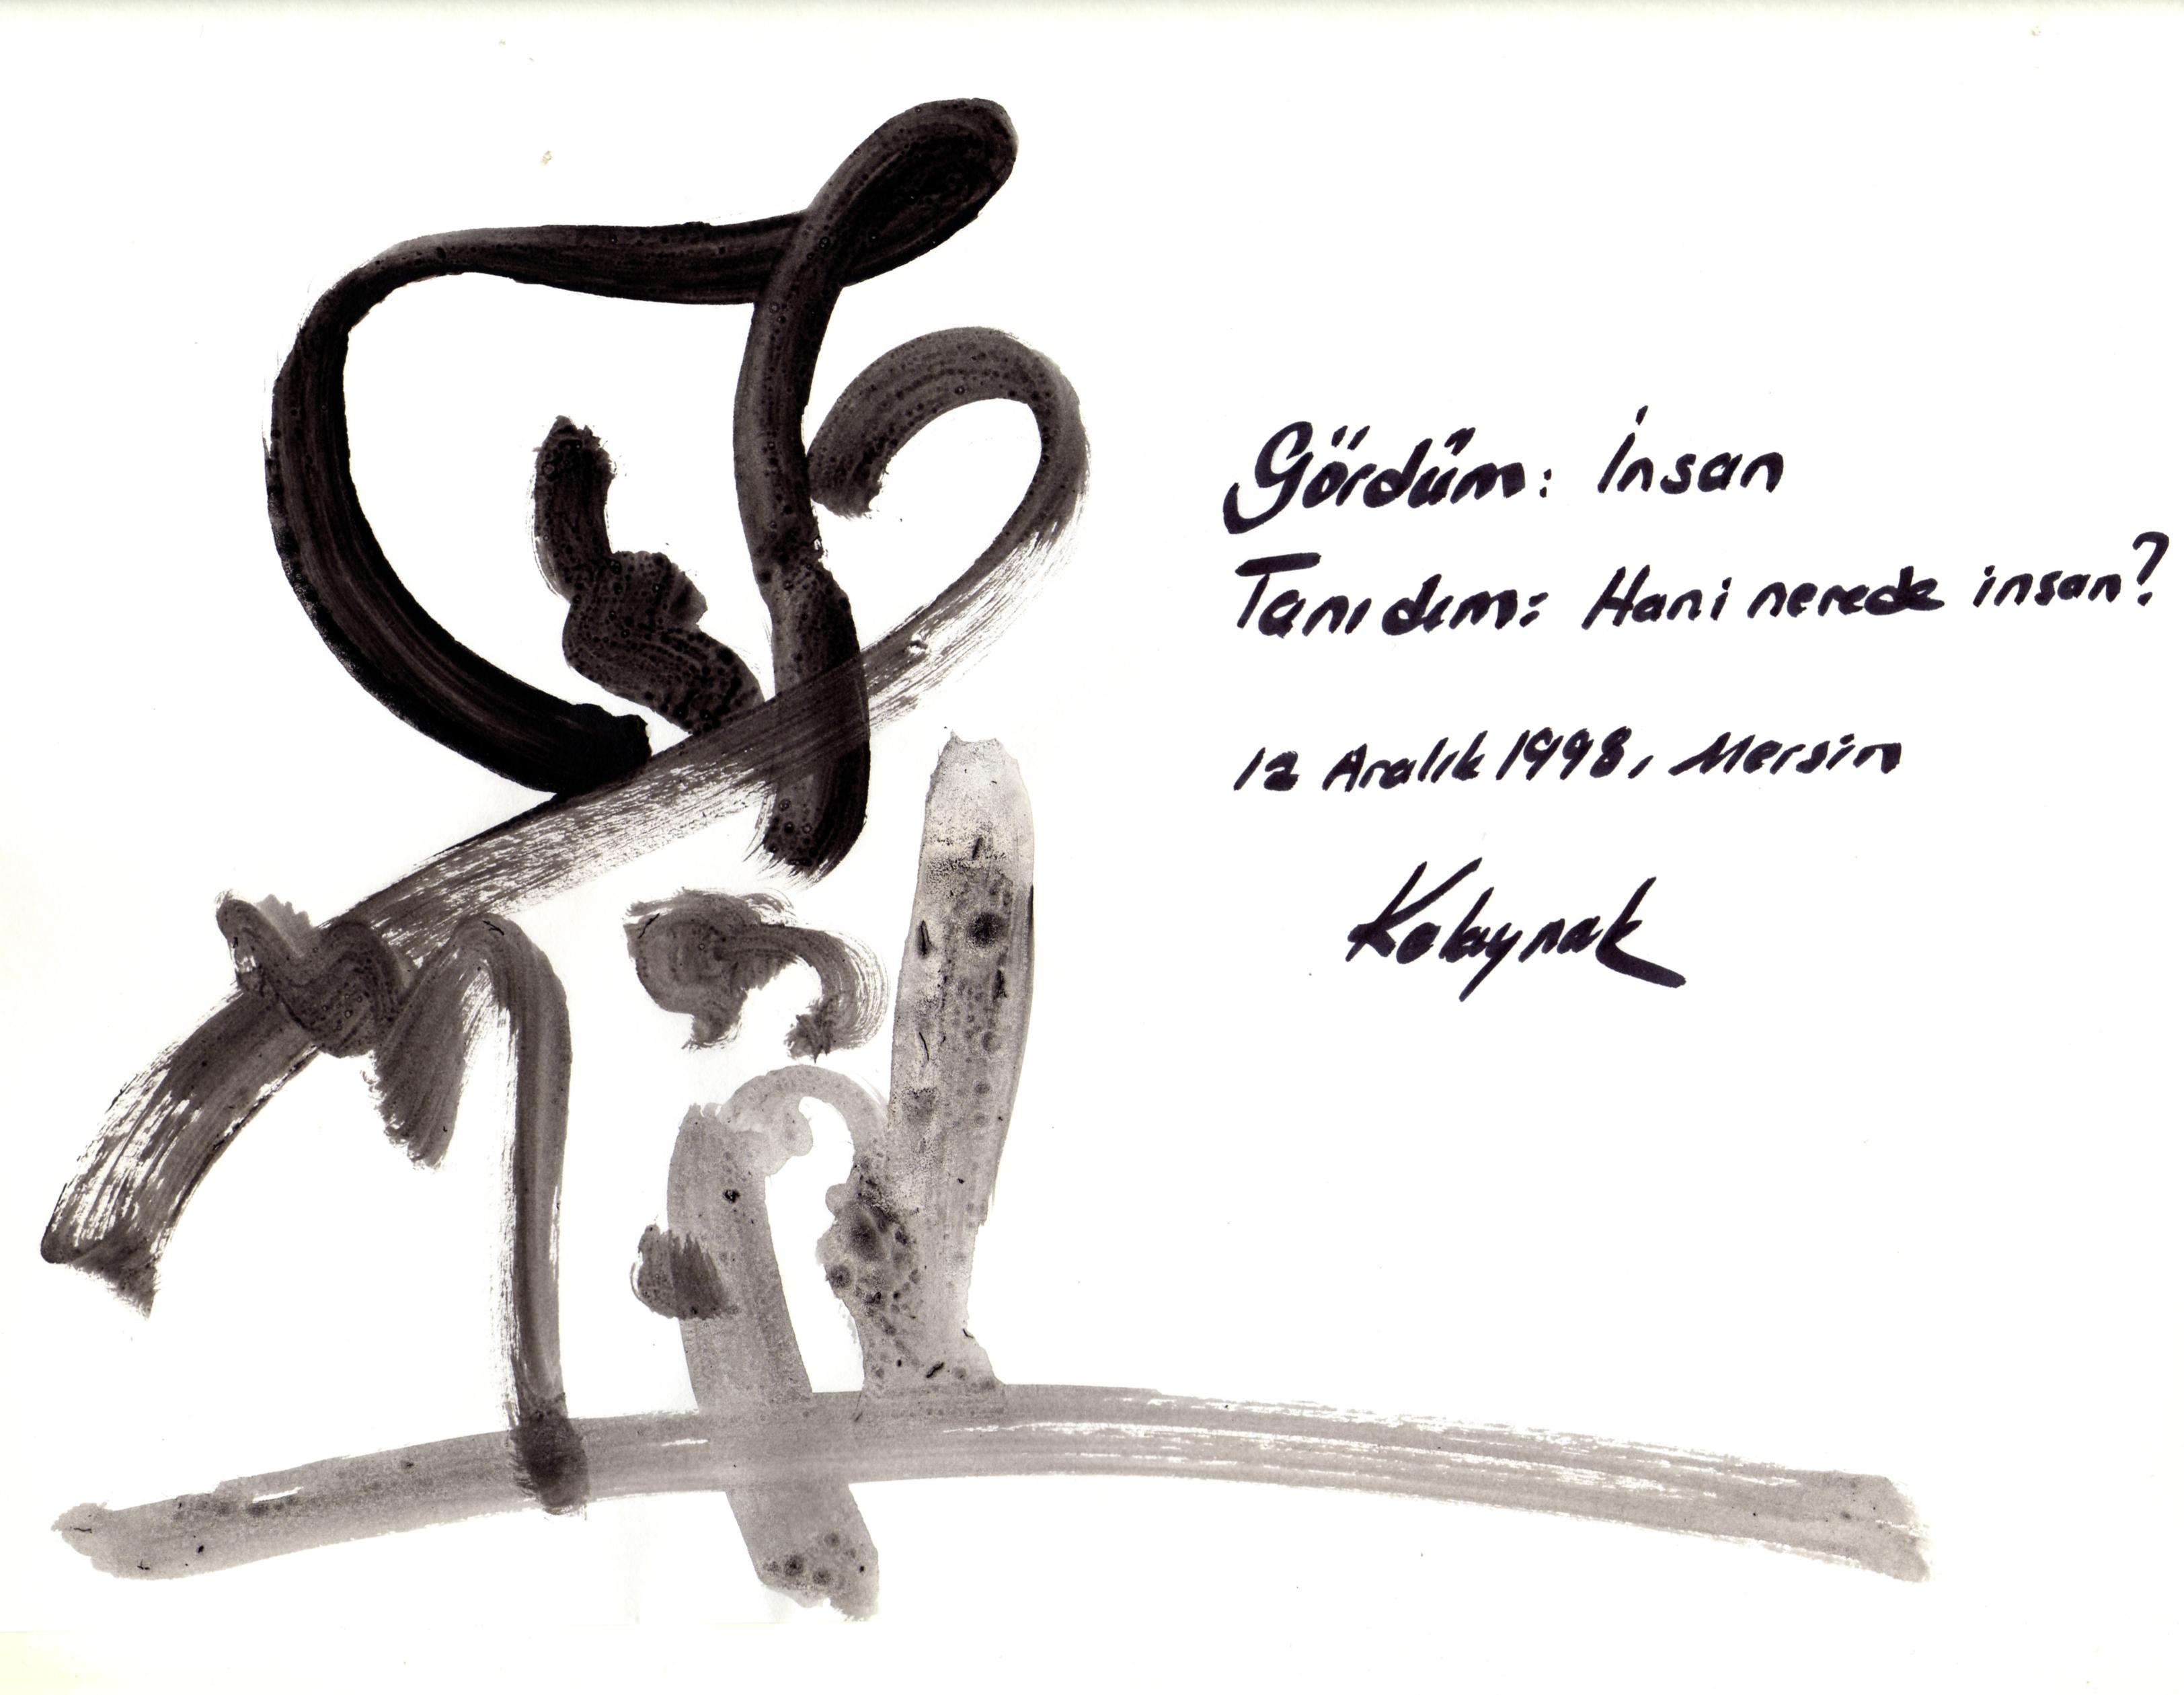 14-GORDUM INSAN